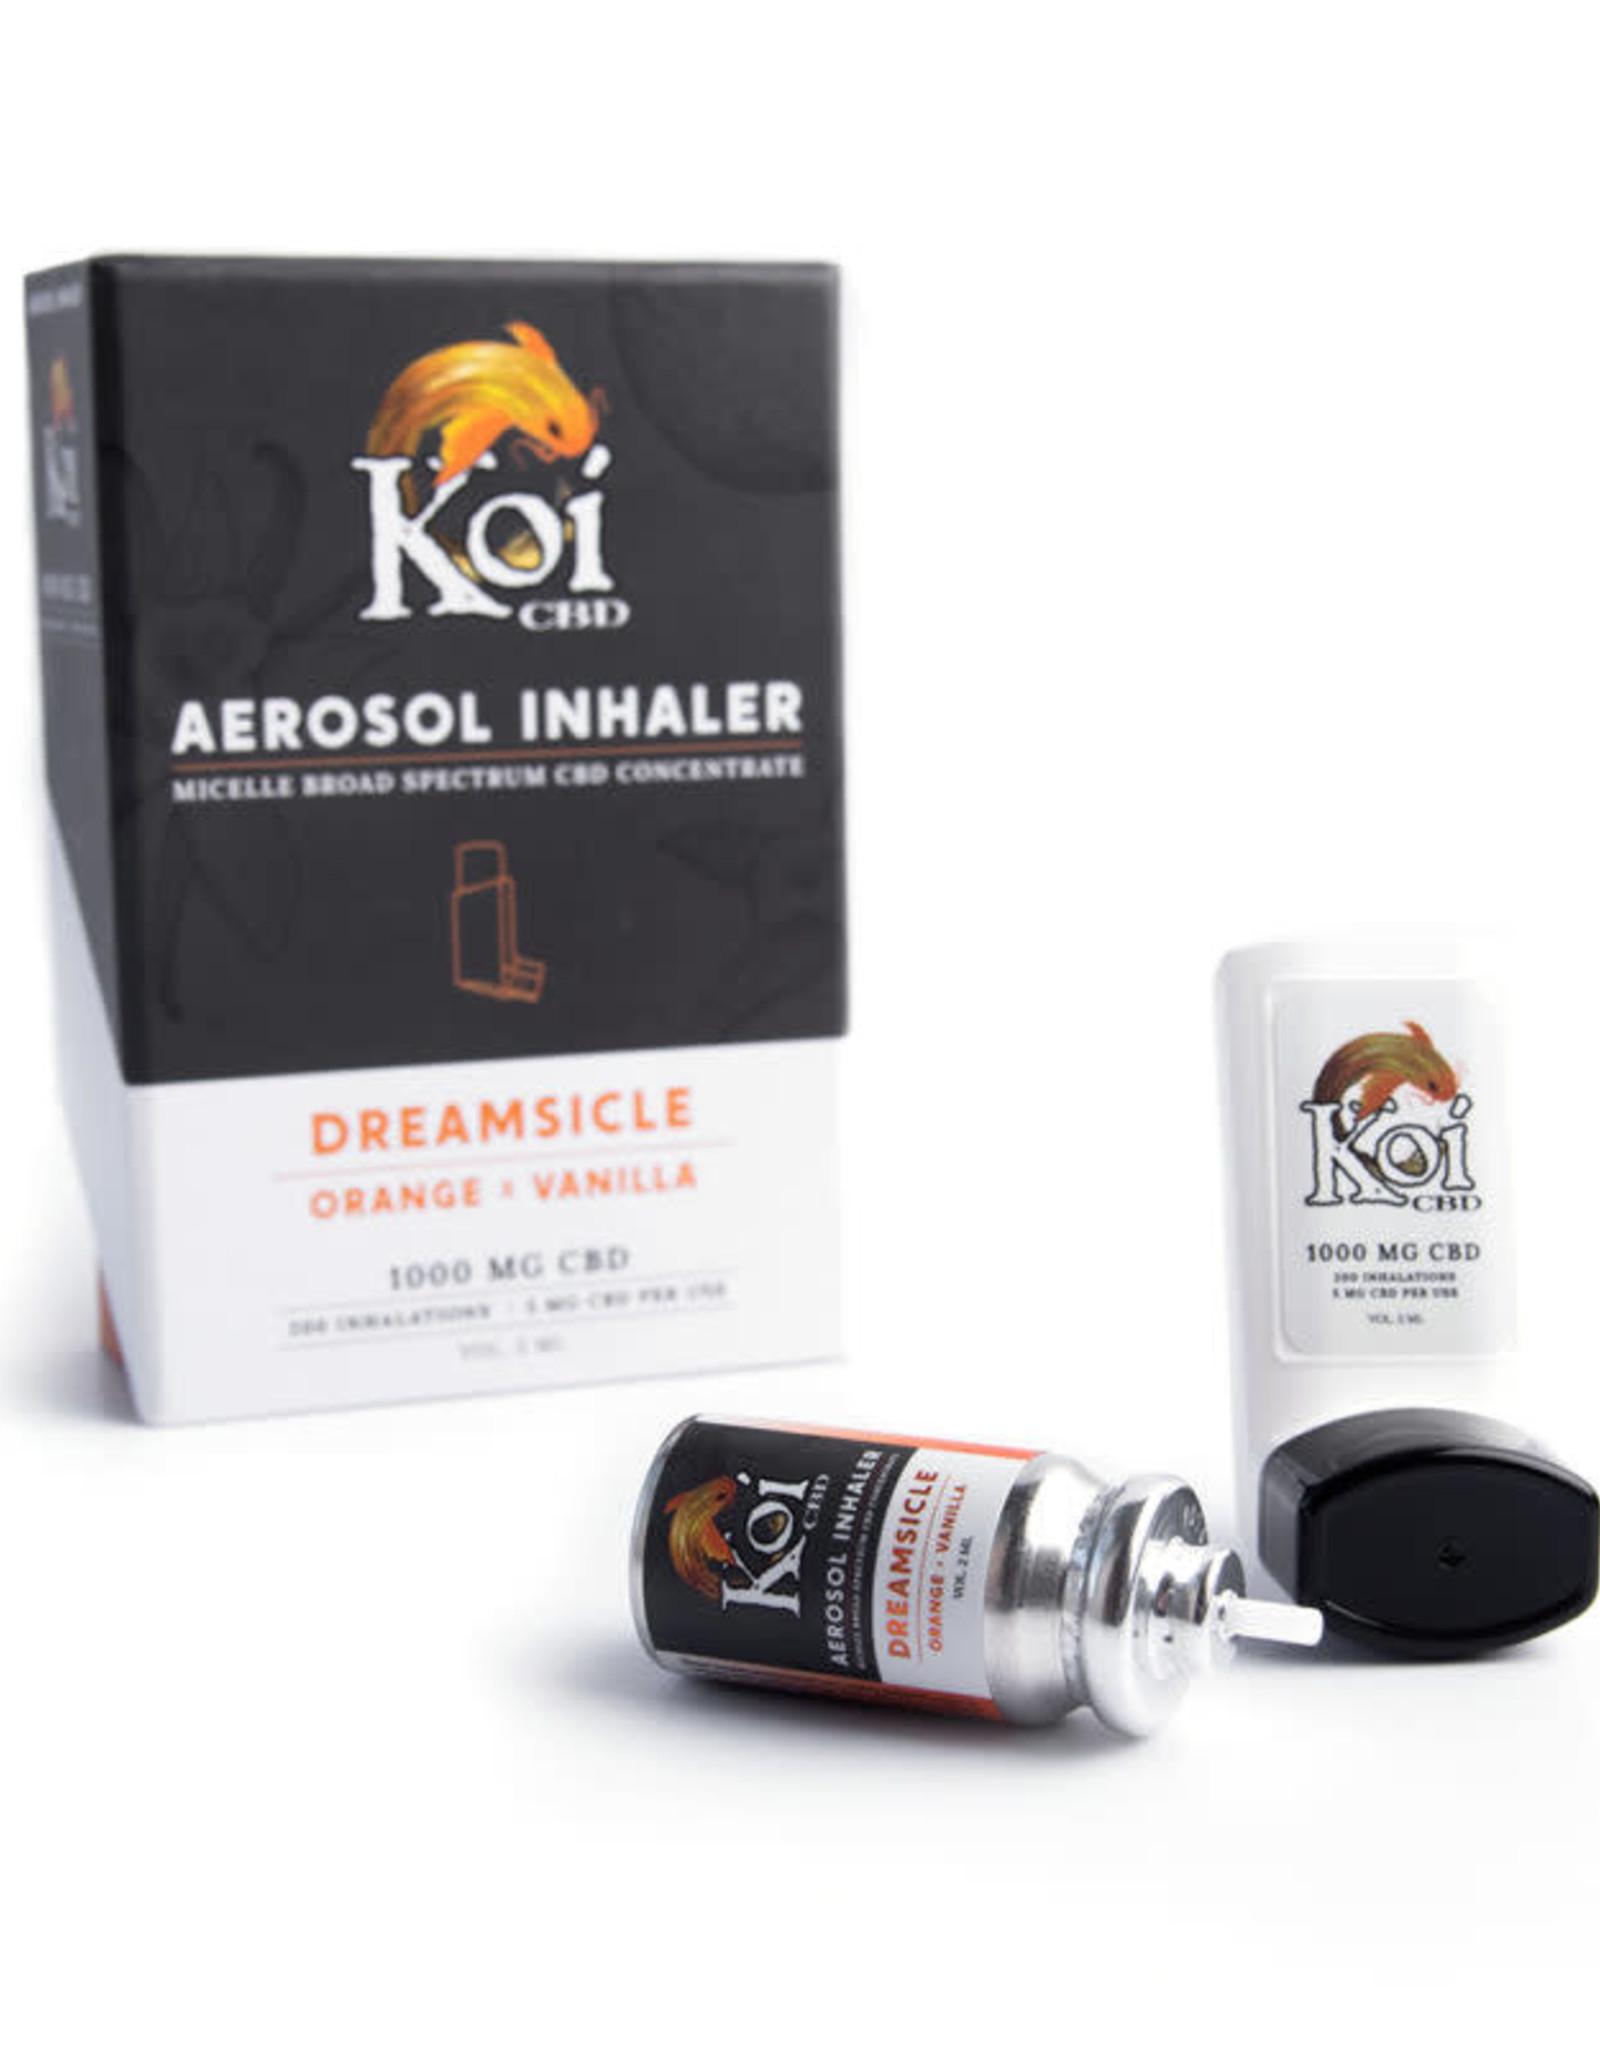 Koi CBD KOI Inhaler